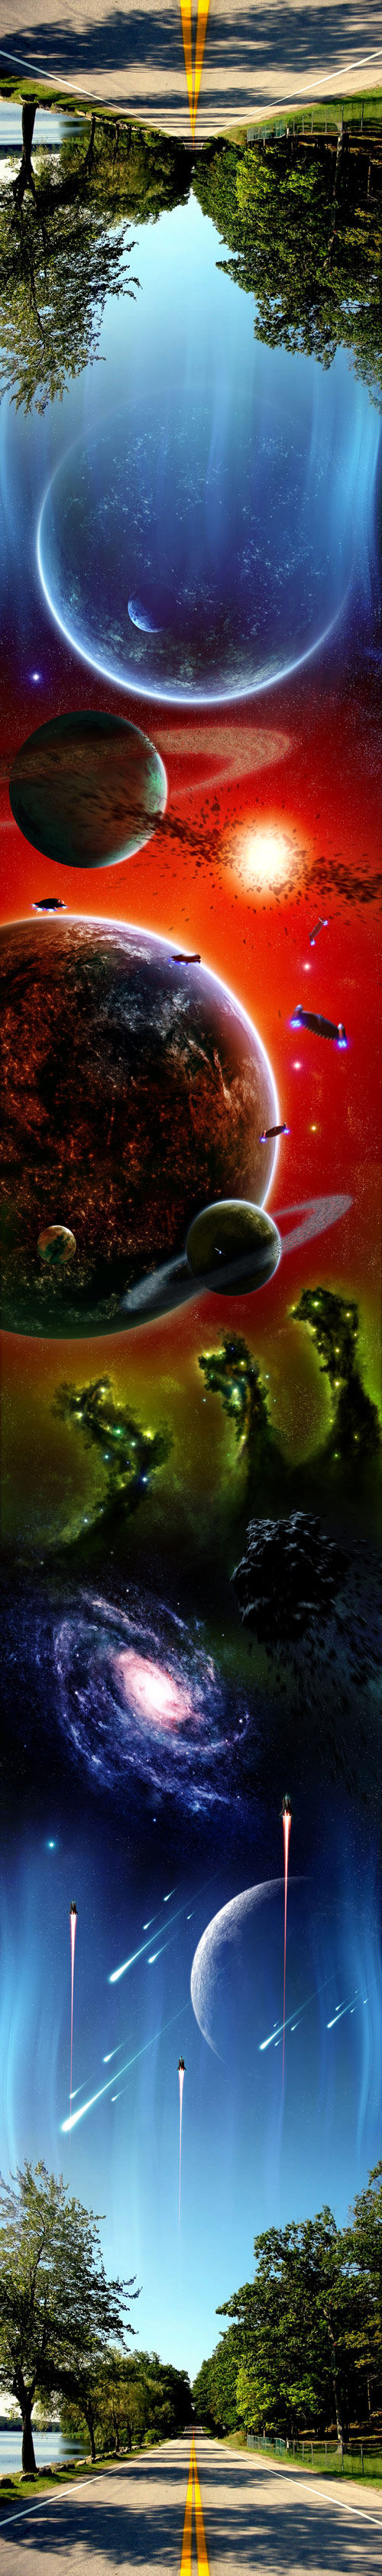 cool-space-pix-unkool-com.jpg